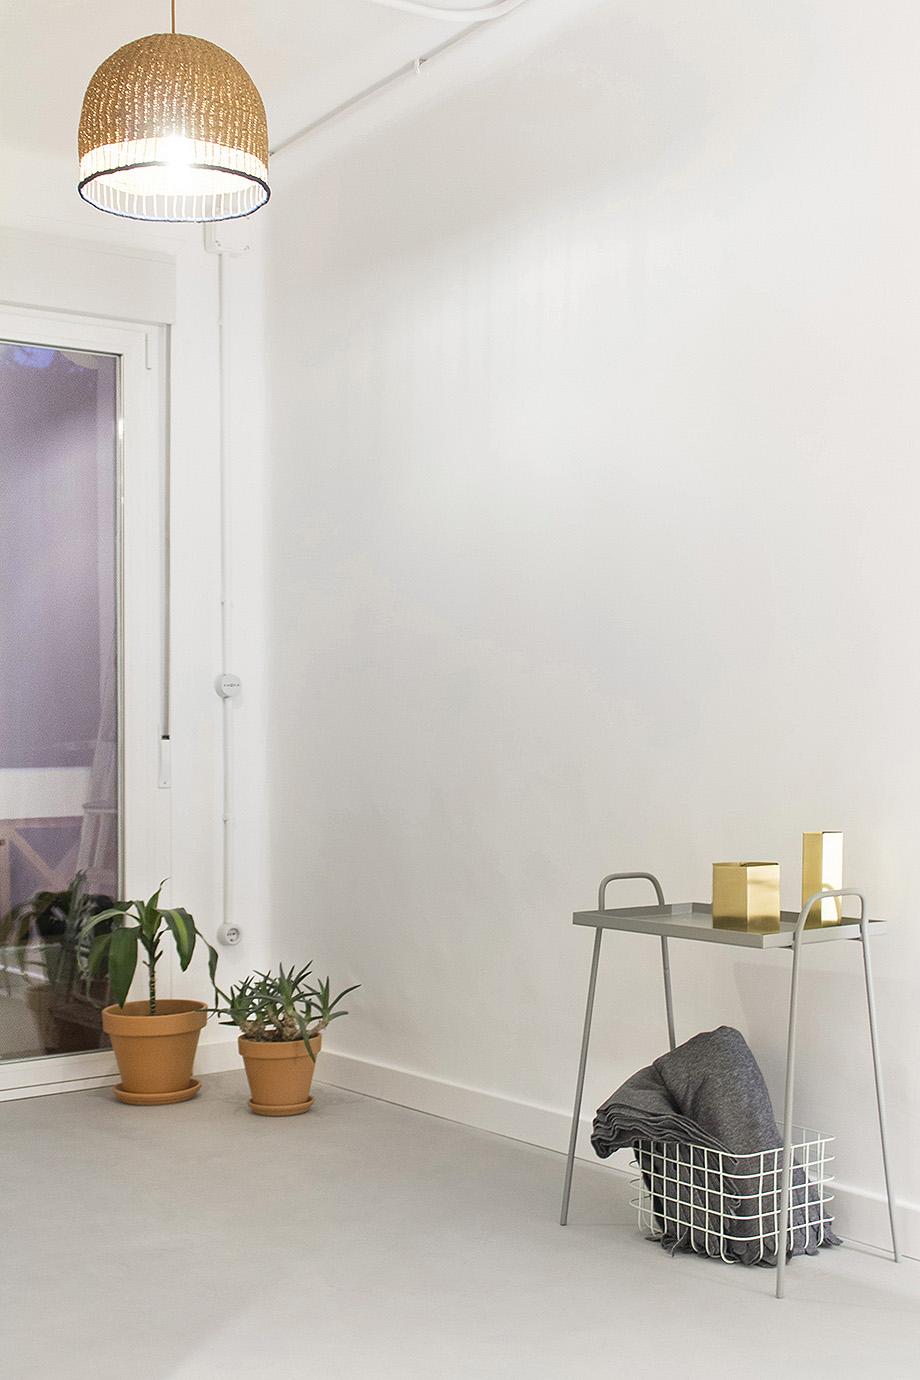 reforma vivienda por estudio amasl - foto carlos anton de la vega (13)